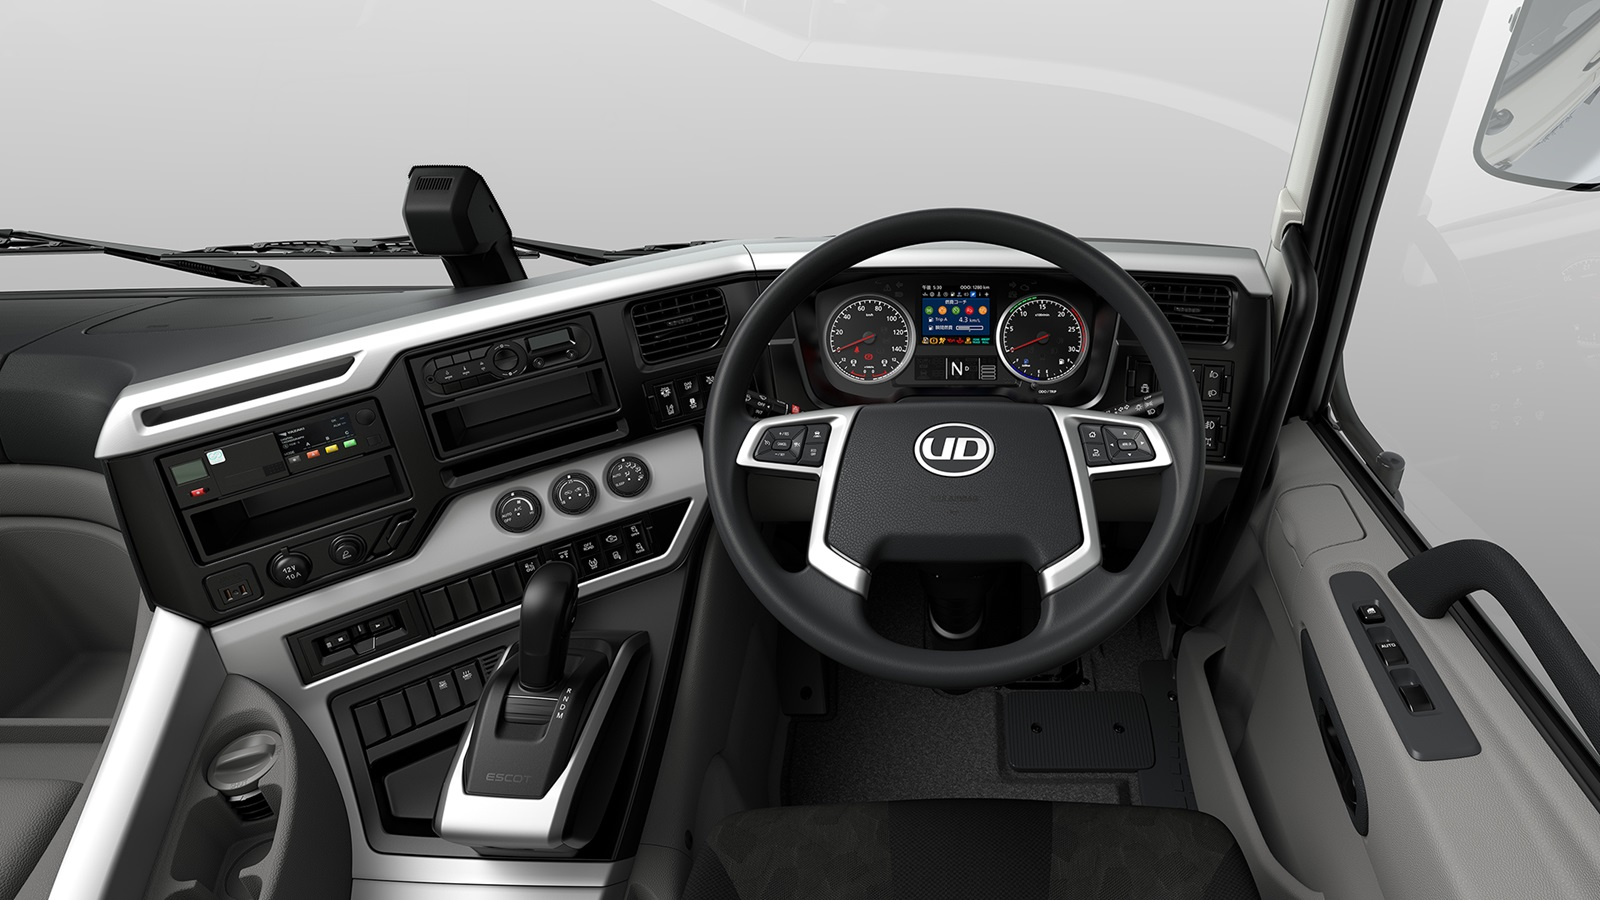 New Quon of UD Trucks – Iepieleaks